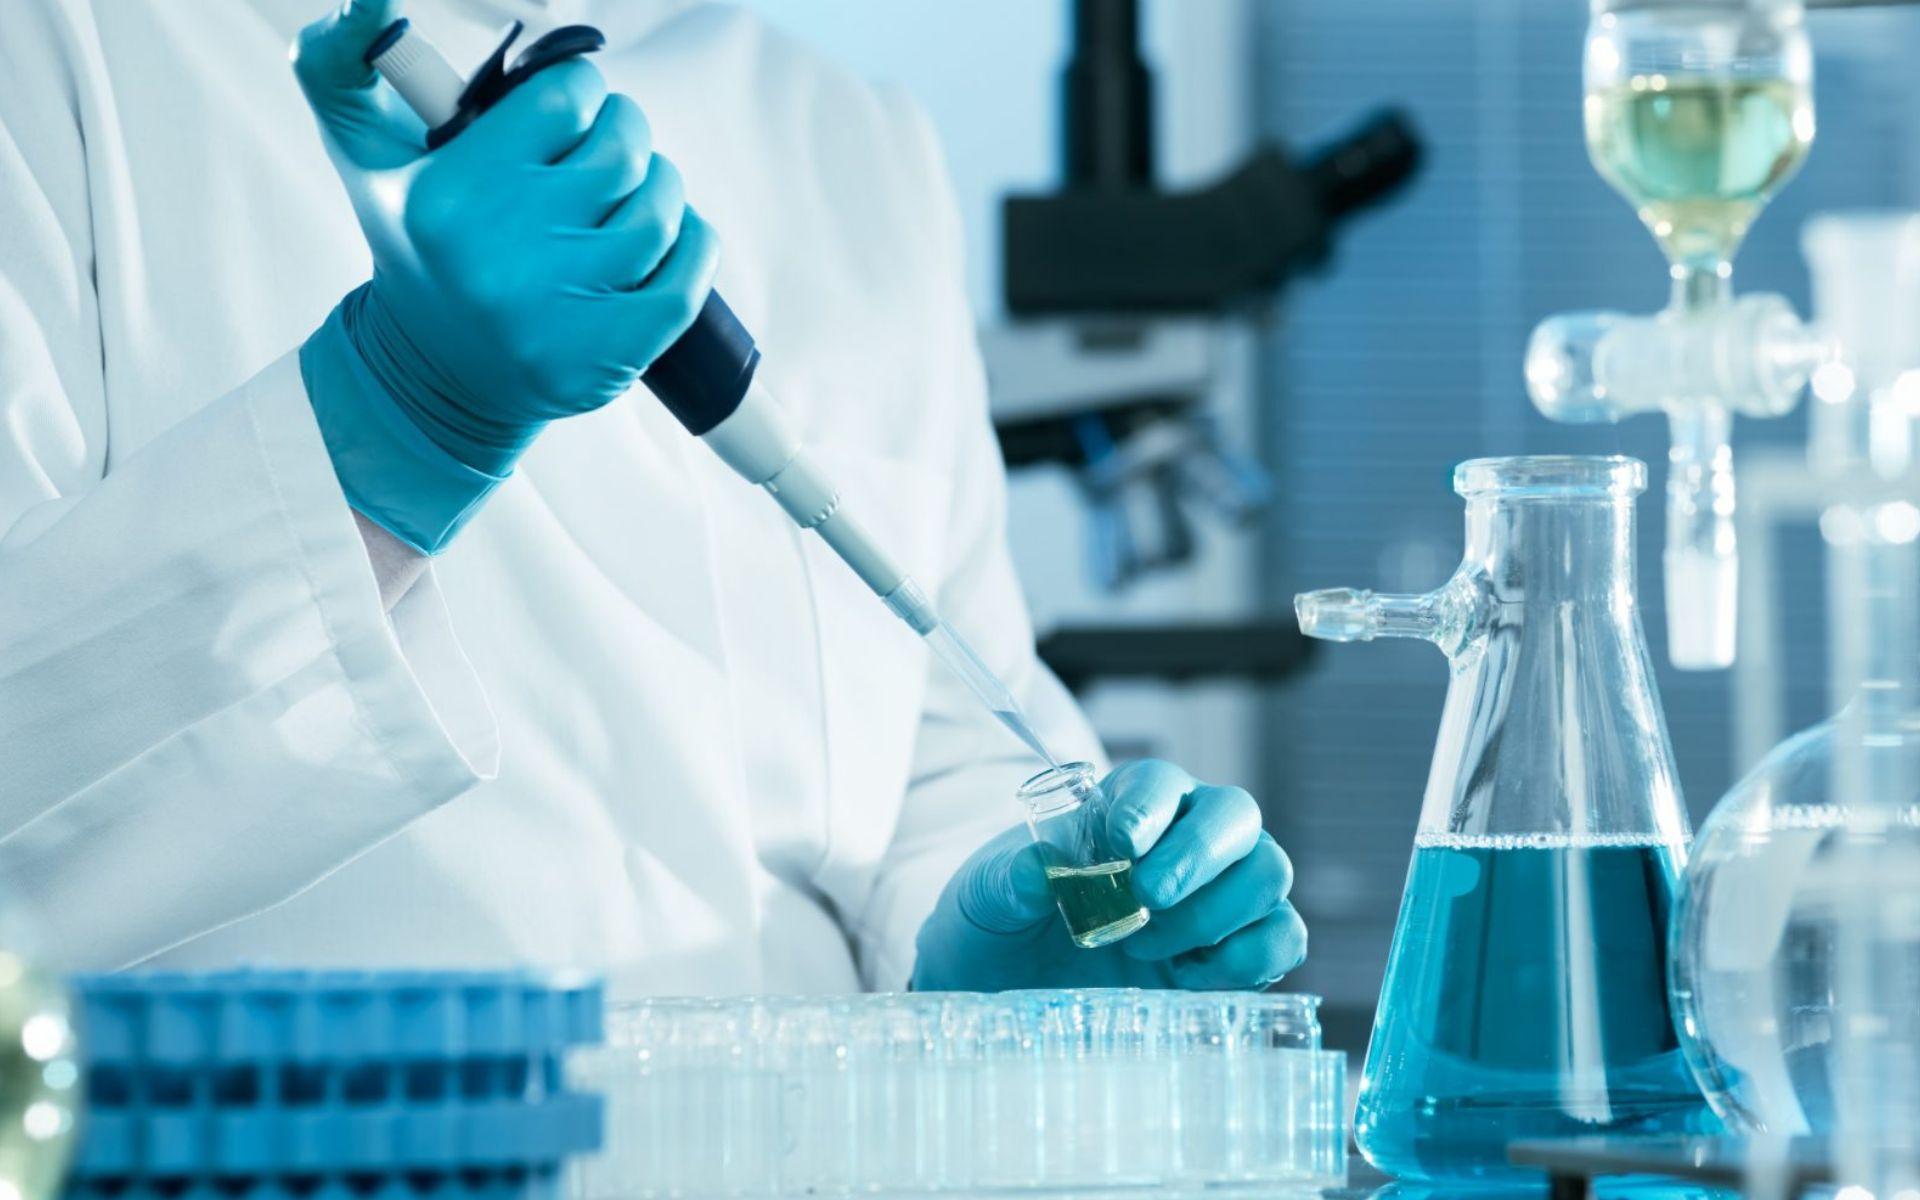 P K CHLOROCHEM PVT LTD | CHEMICAL MANUFACTURING